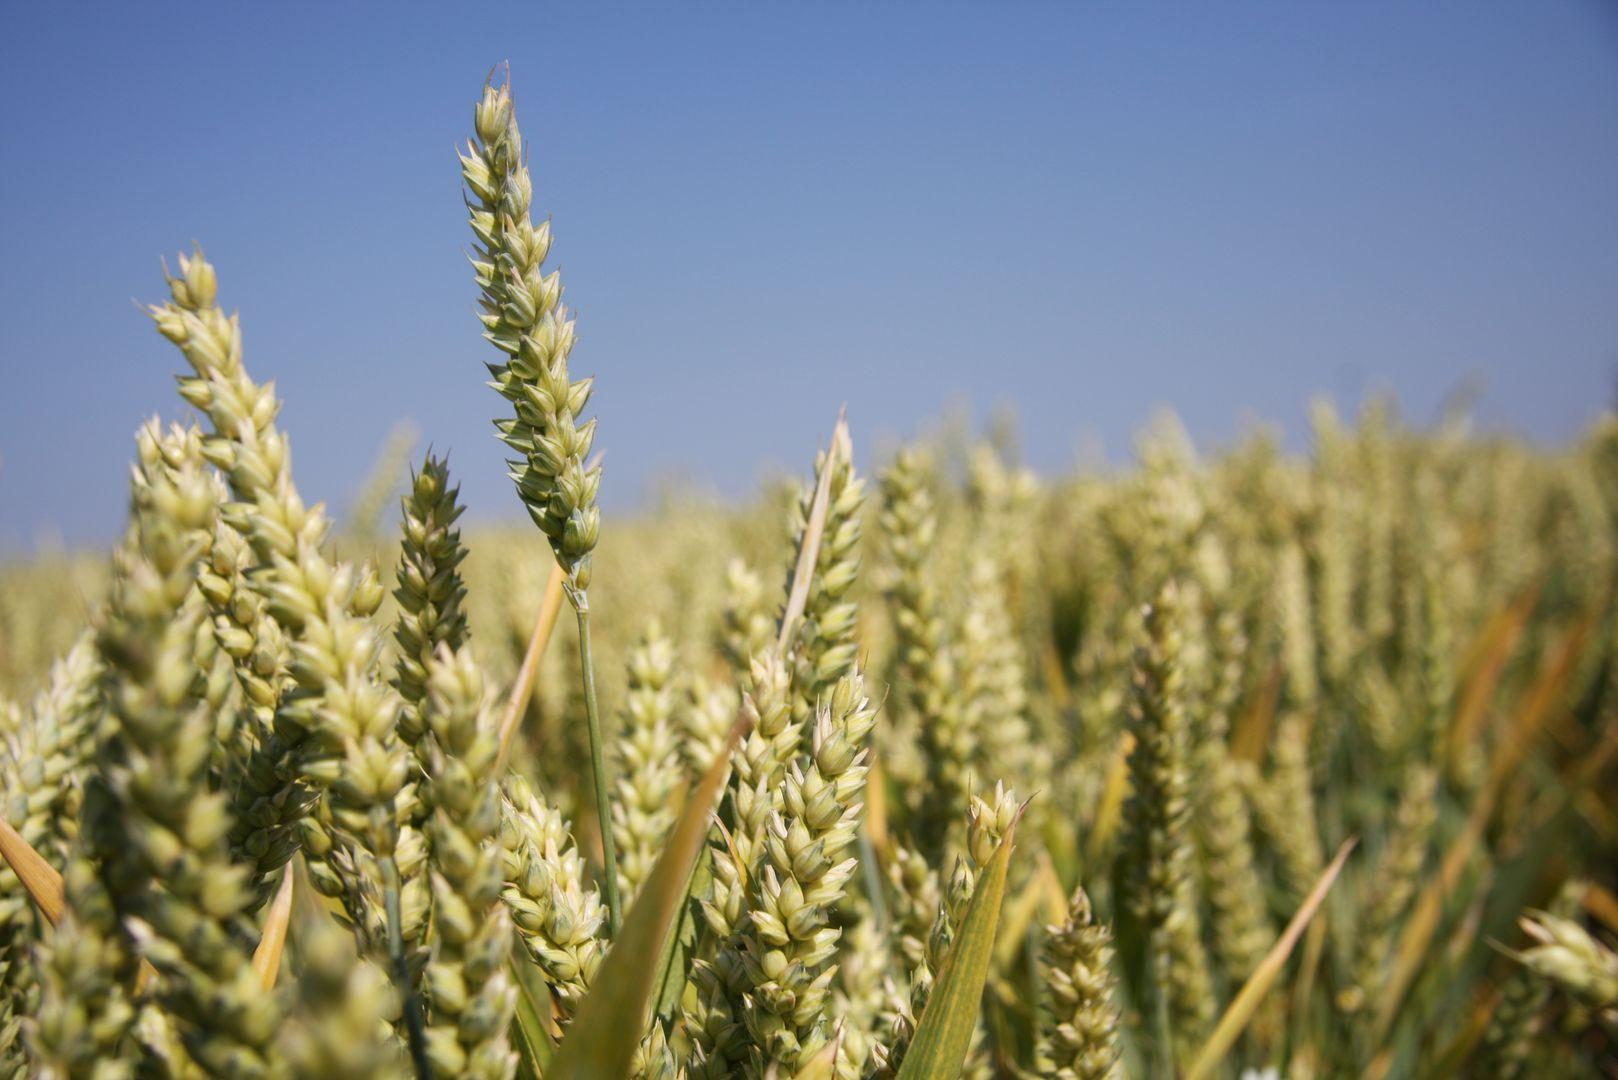 Weizenähren zu Beginn der Reife vor blauem Himmel